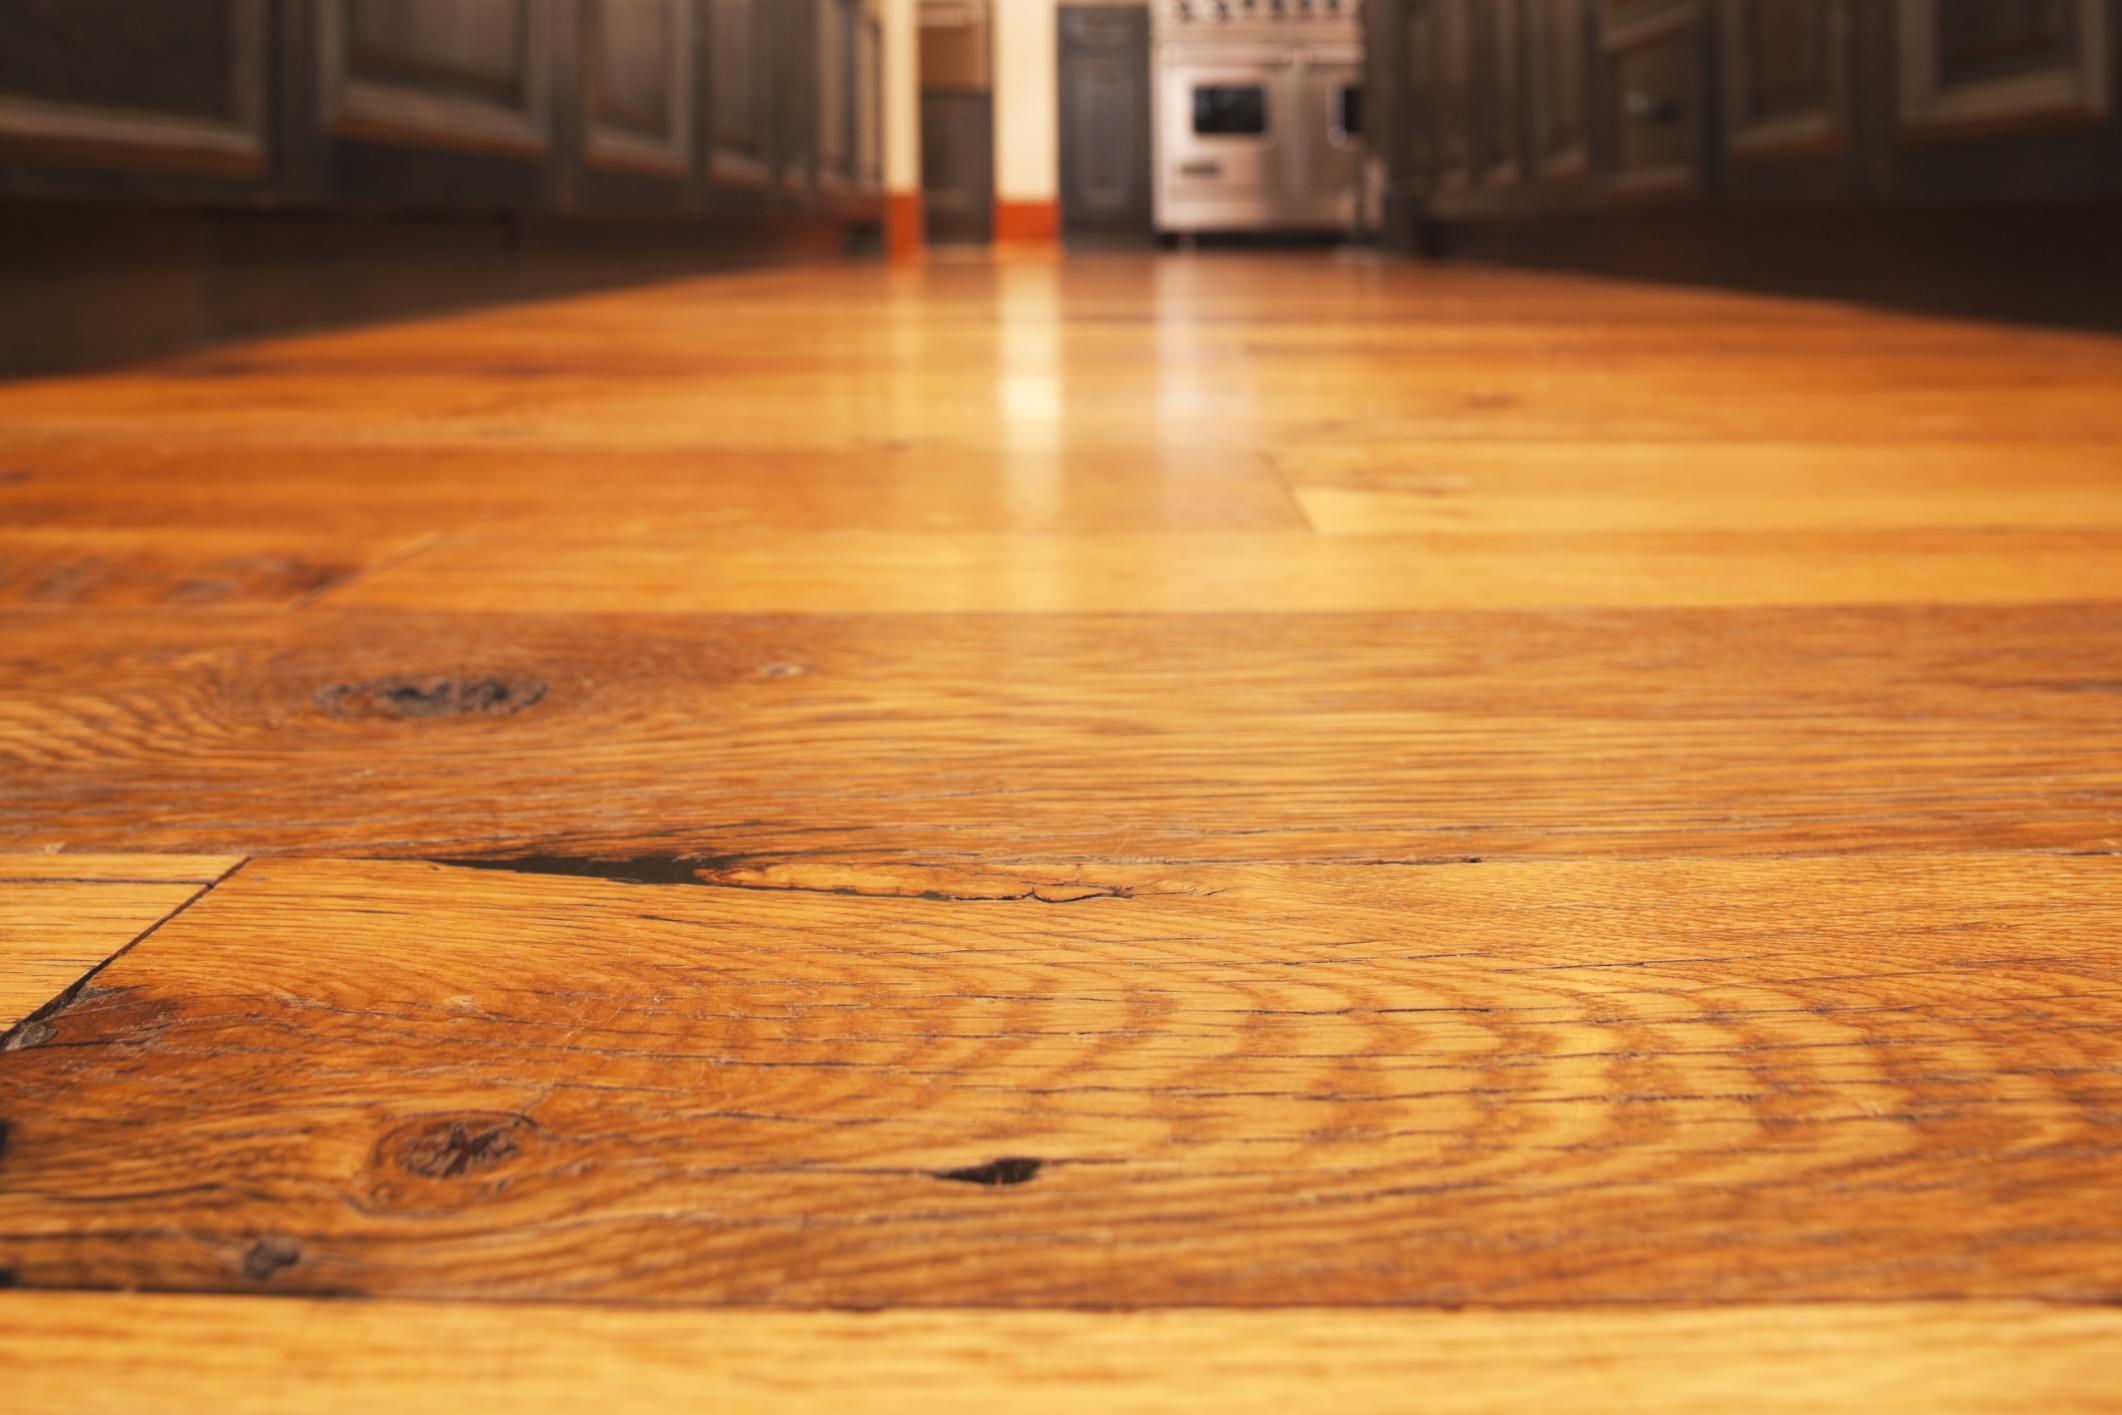 finishing new hardwood floors yourself of how to sand hardwood floors regarding 185126347 56a49f3d5f9b58b7d0d7e154